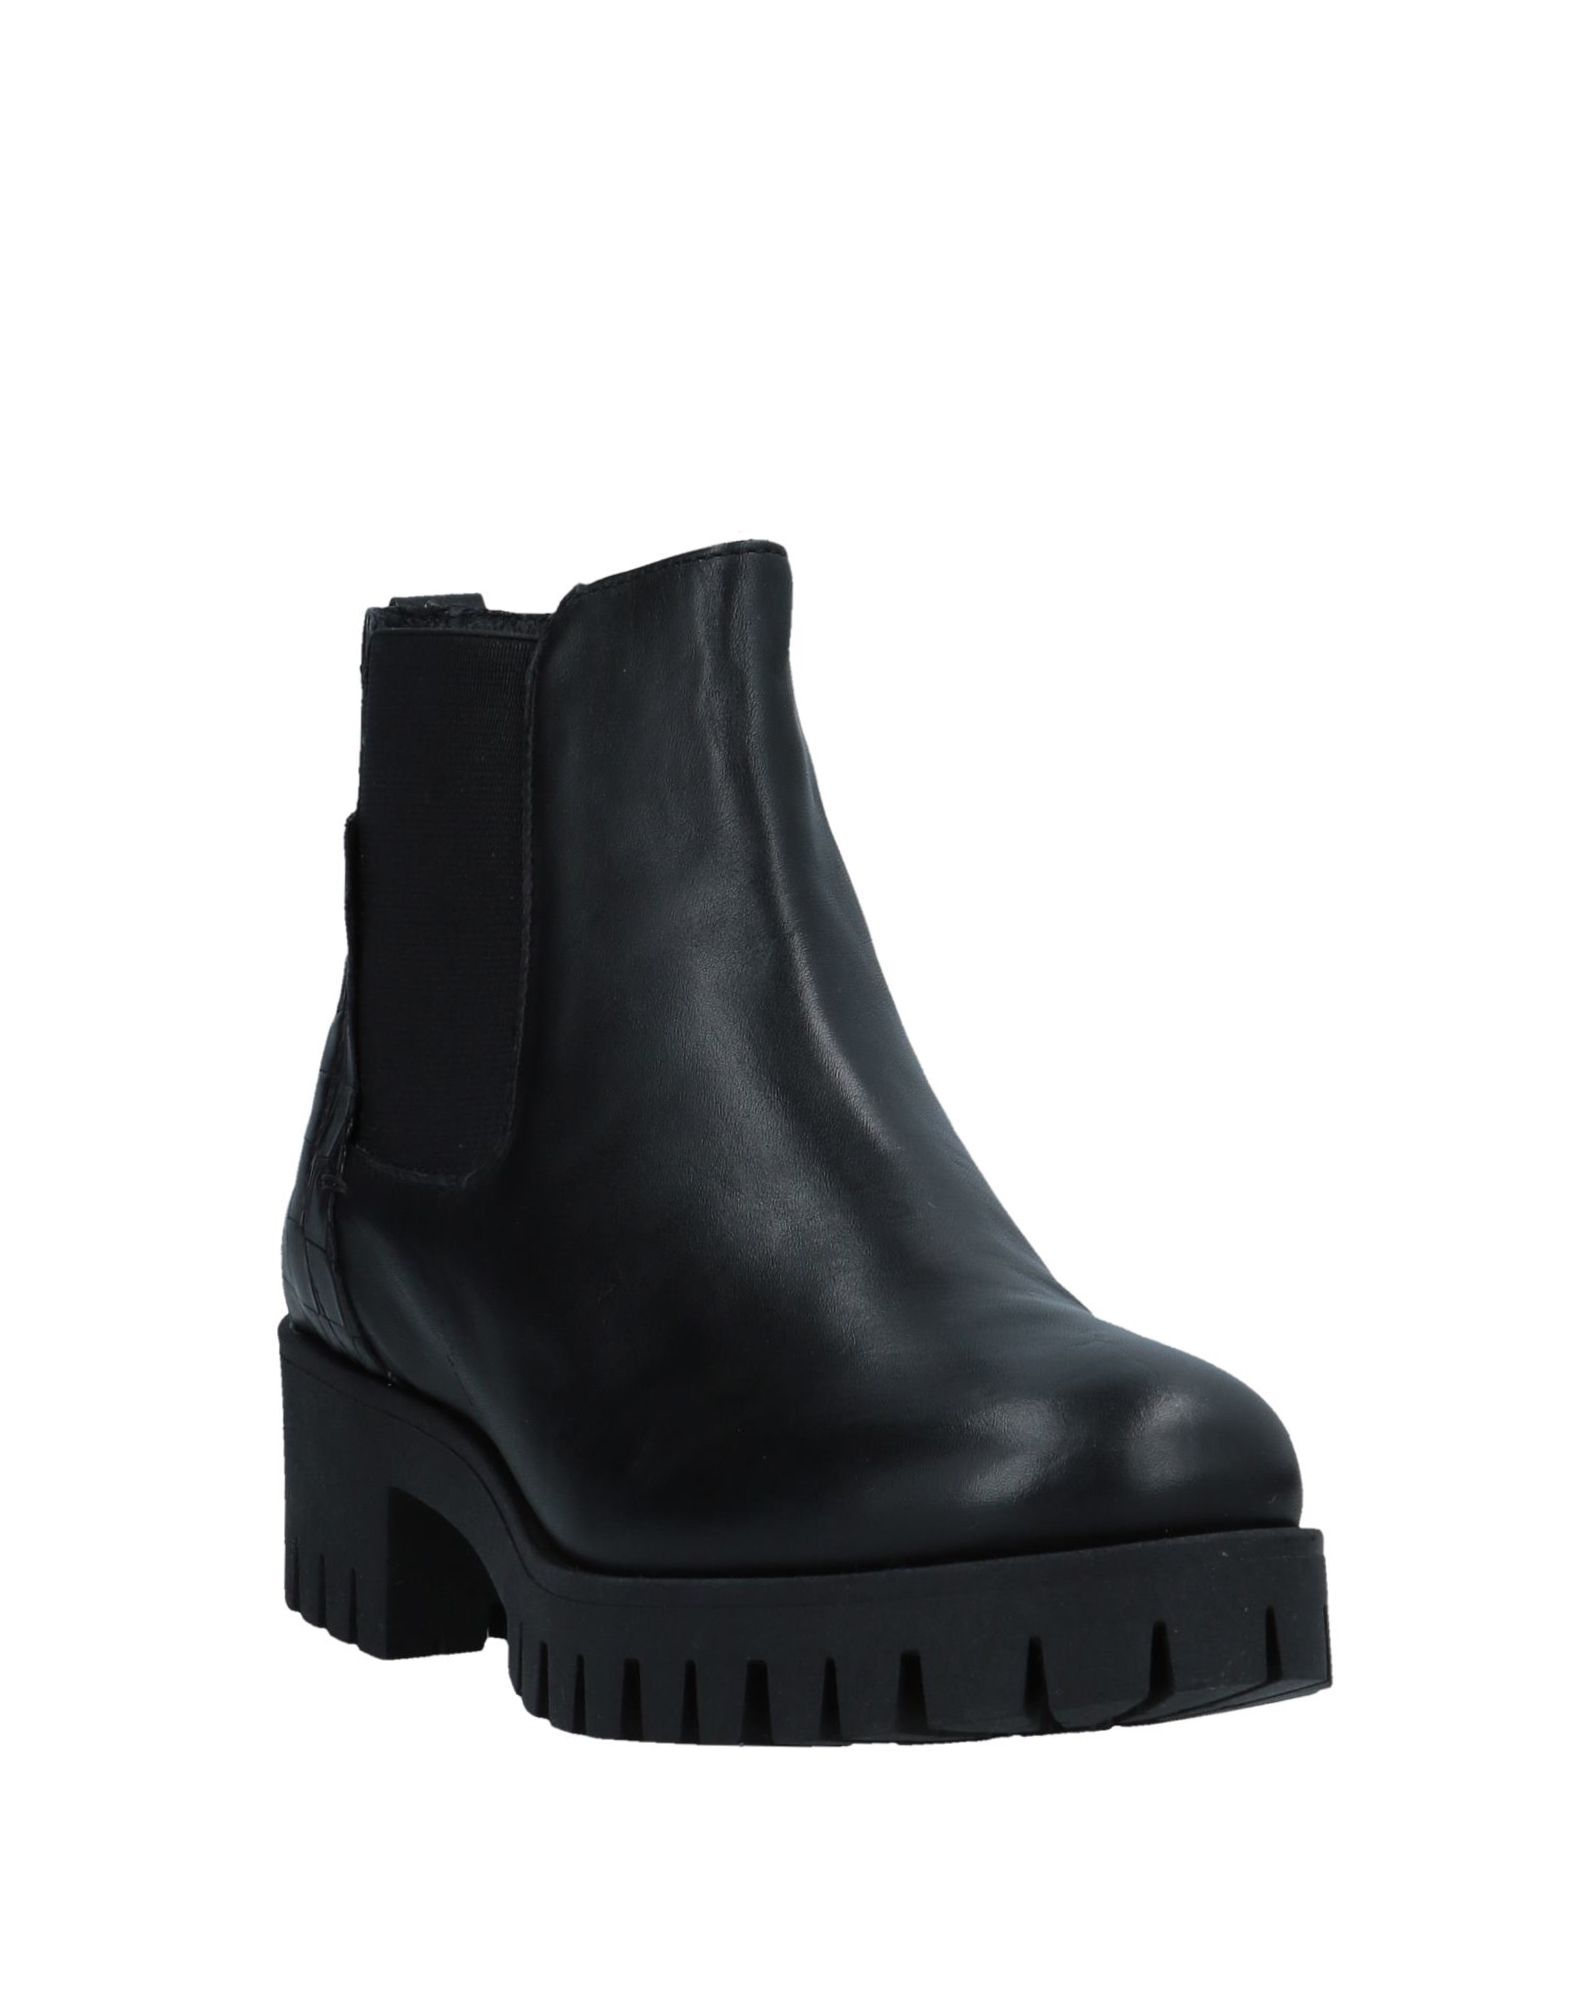 Gut um billige Boots Schuhe zu tragenAngel Chelsea Boots billige Damen  11547052SE 58cb85